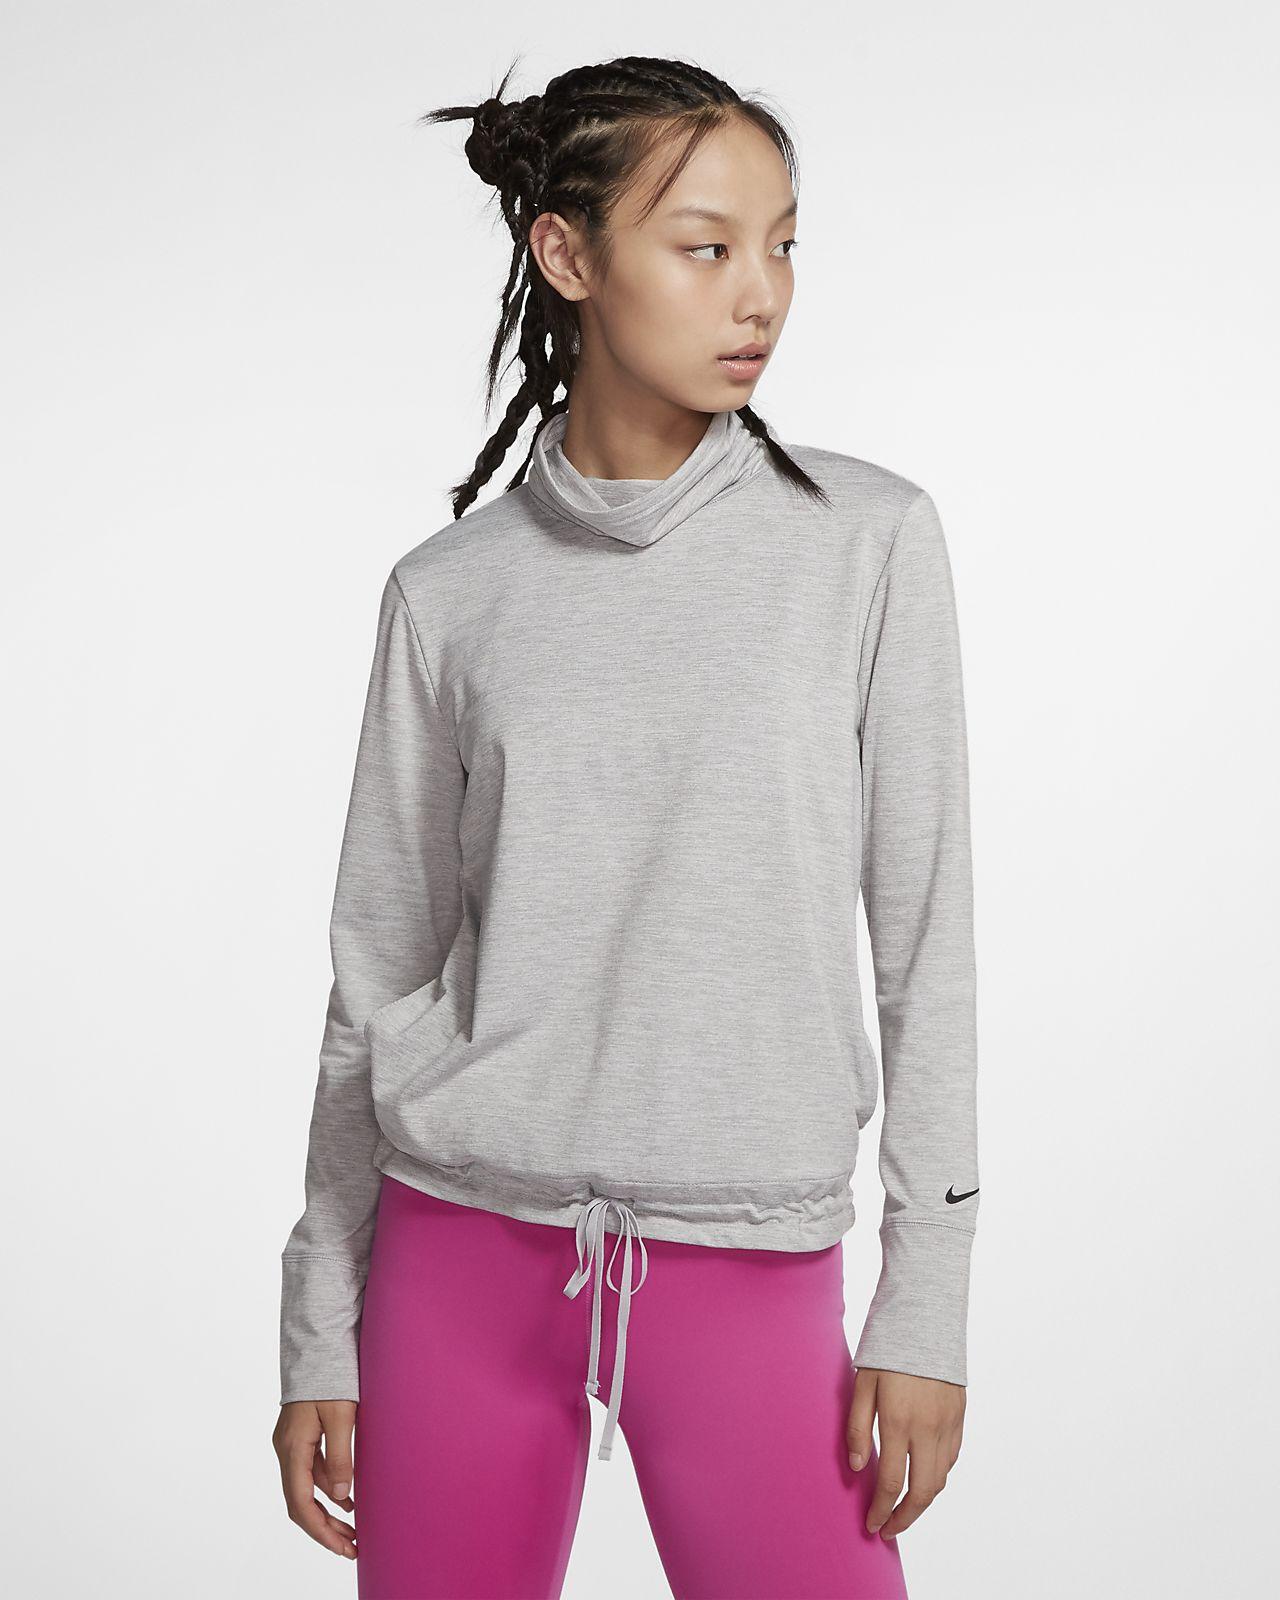 Nike Yoga 女款高領圓領上衣